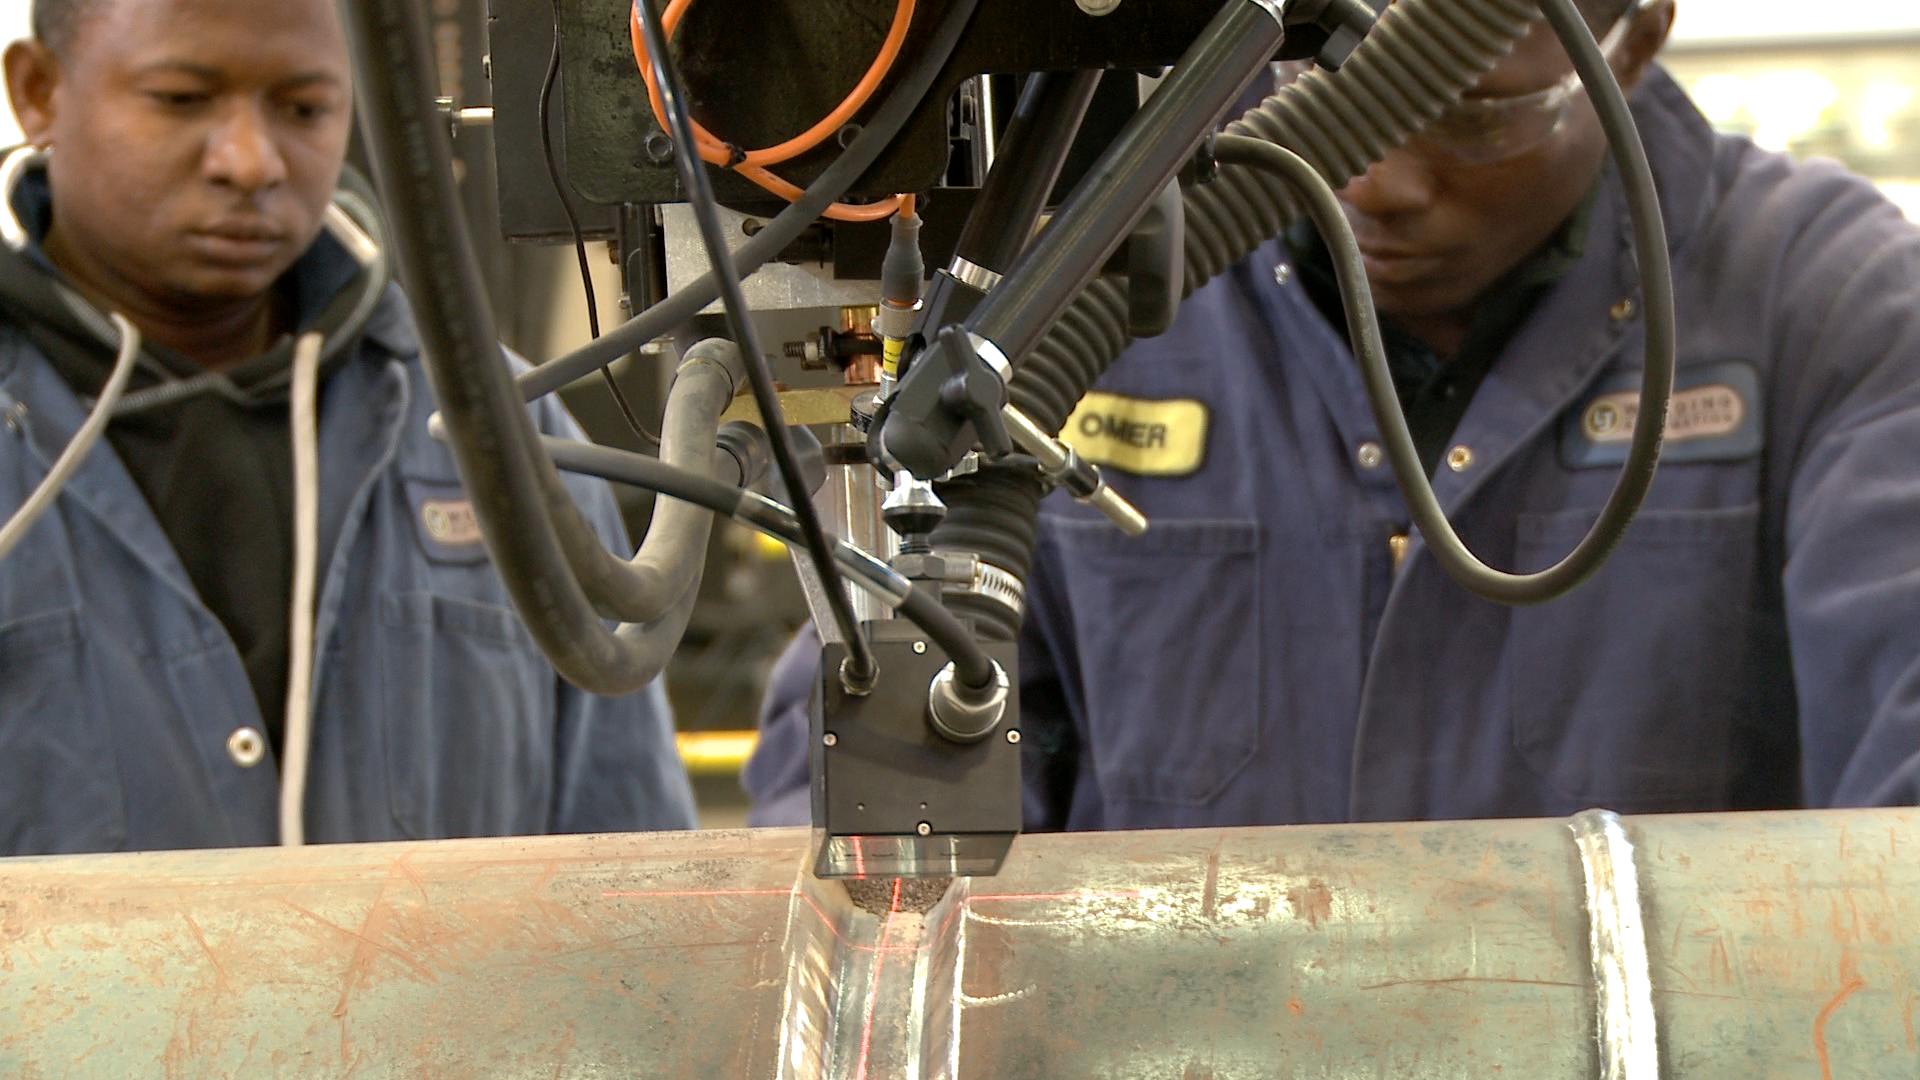 laser seam tracking on a subarc welding manipulator.